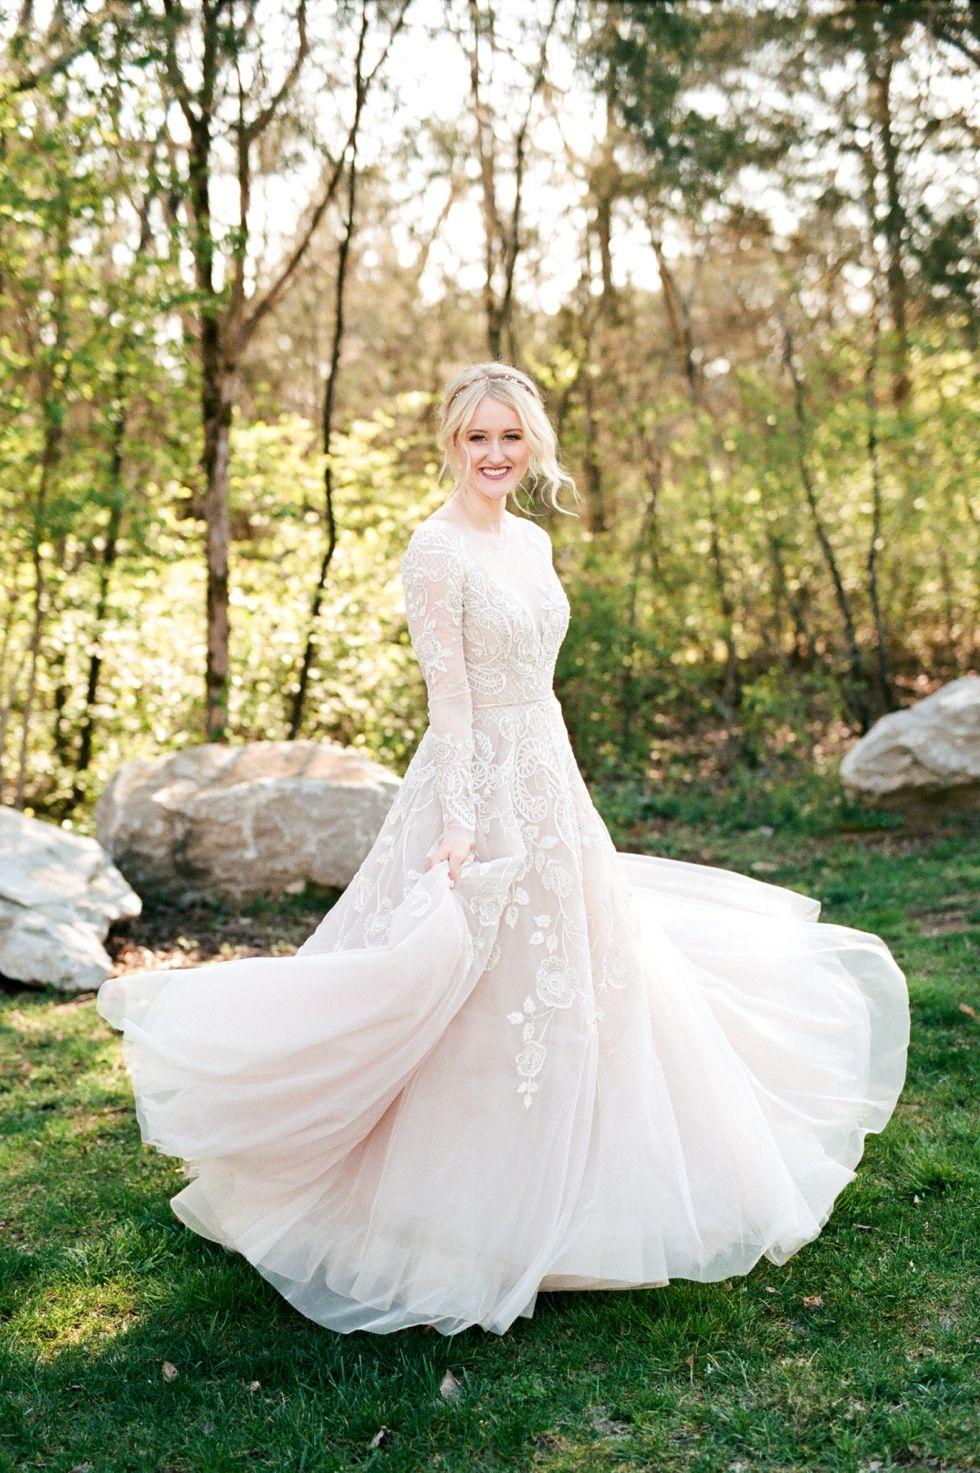 Fairytale Wedding In Nashville Graystone Quarry Wedding Photographer Dream Wedding Dresses Western Wedding Dresses Mermaid Wedding Dress